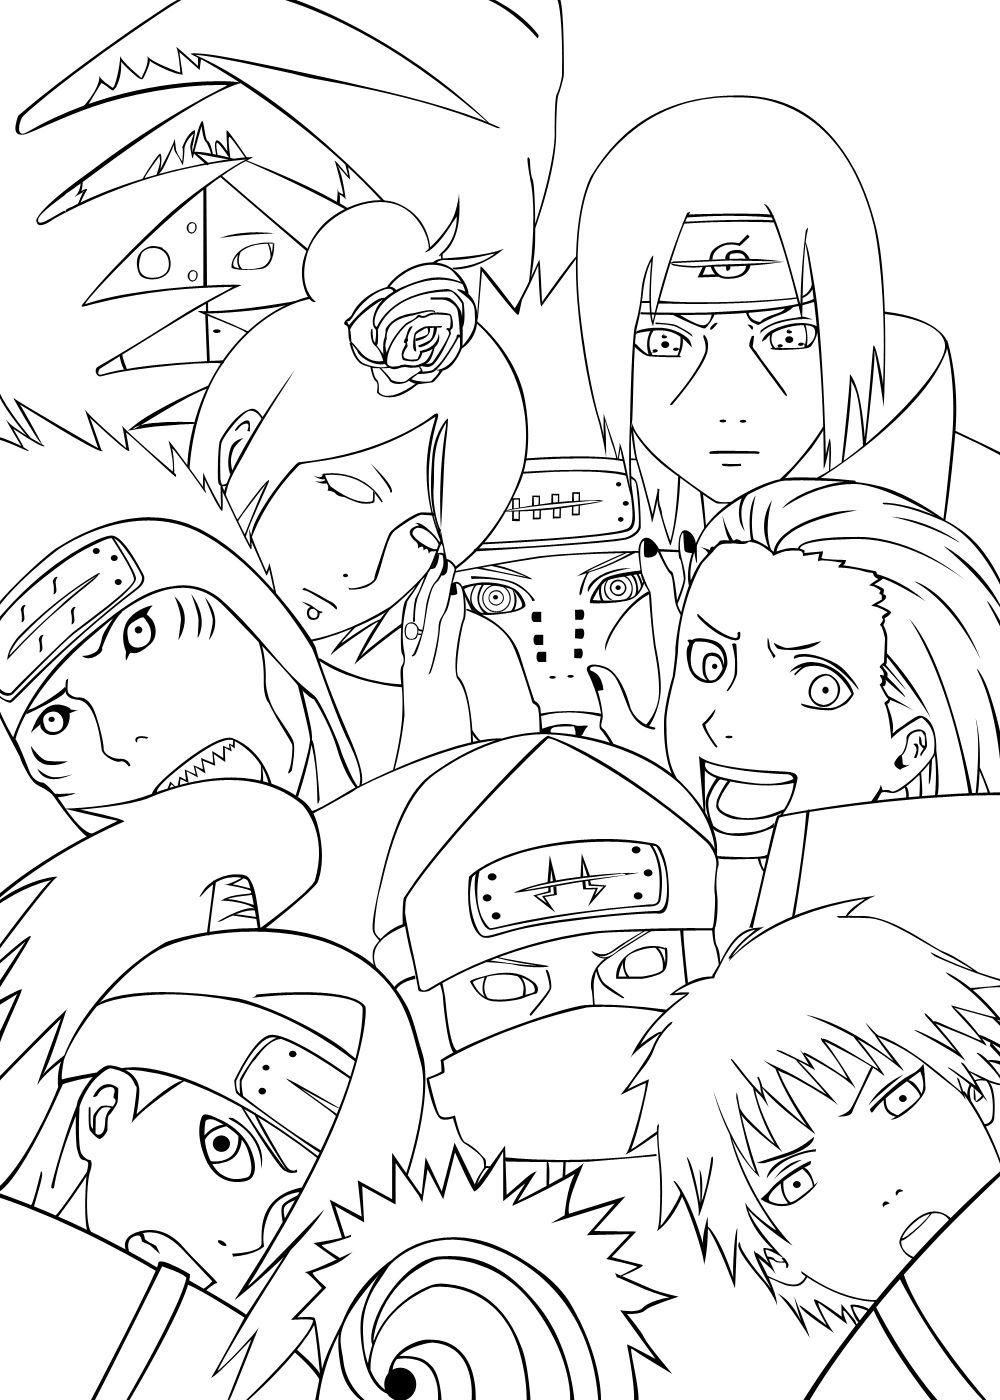 Pin de spetri en LineArt: Naruto   Pinterest